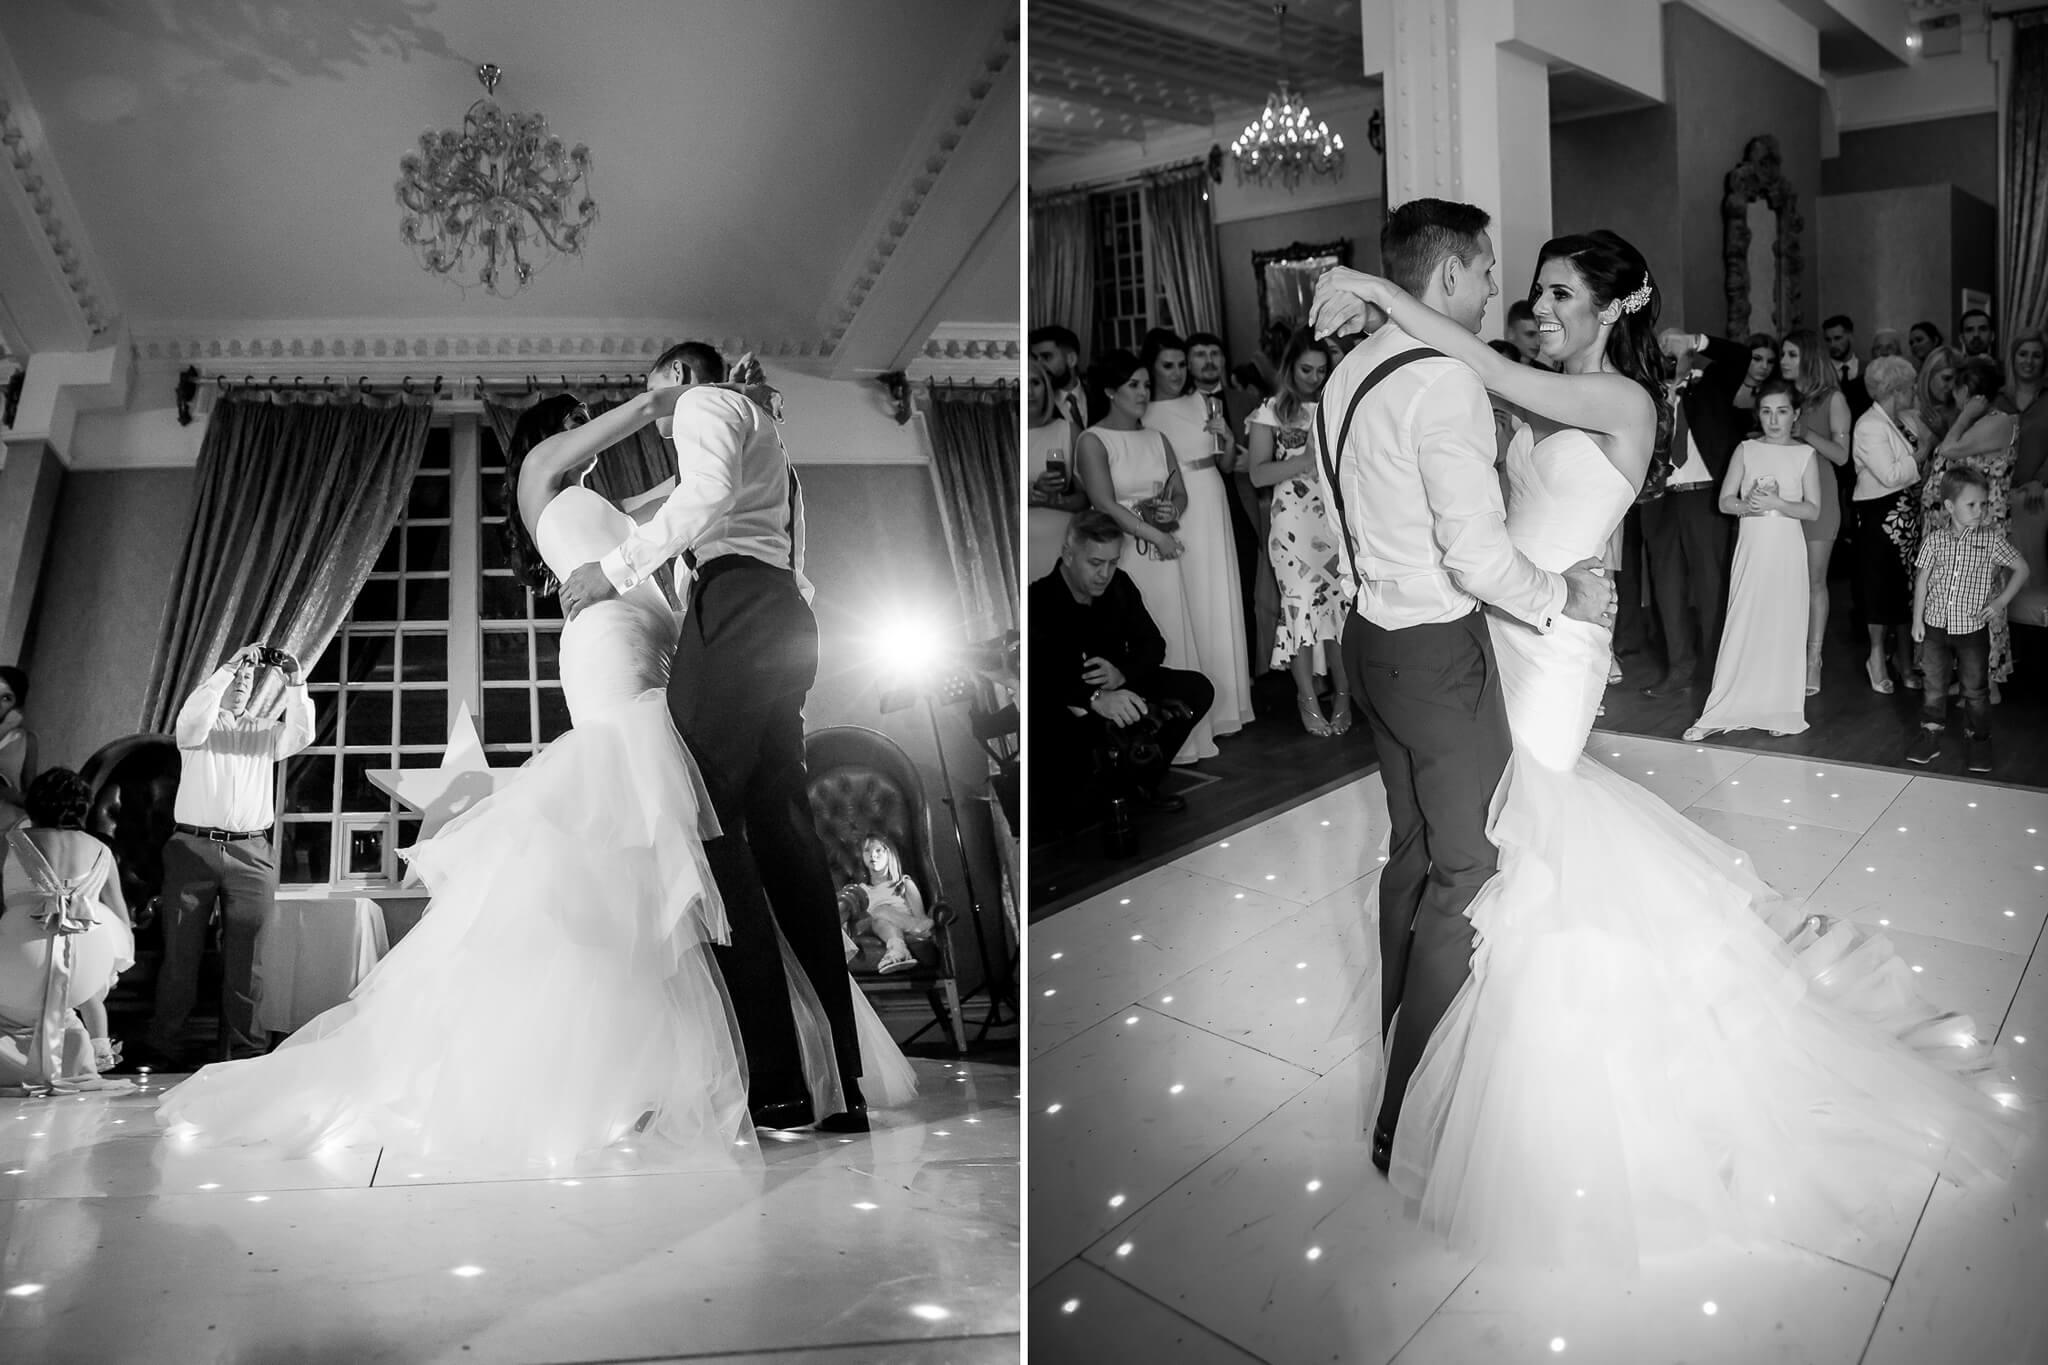 bride-groom-evening-first-dance-liverpool-wedding-photography